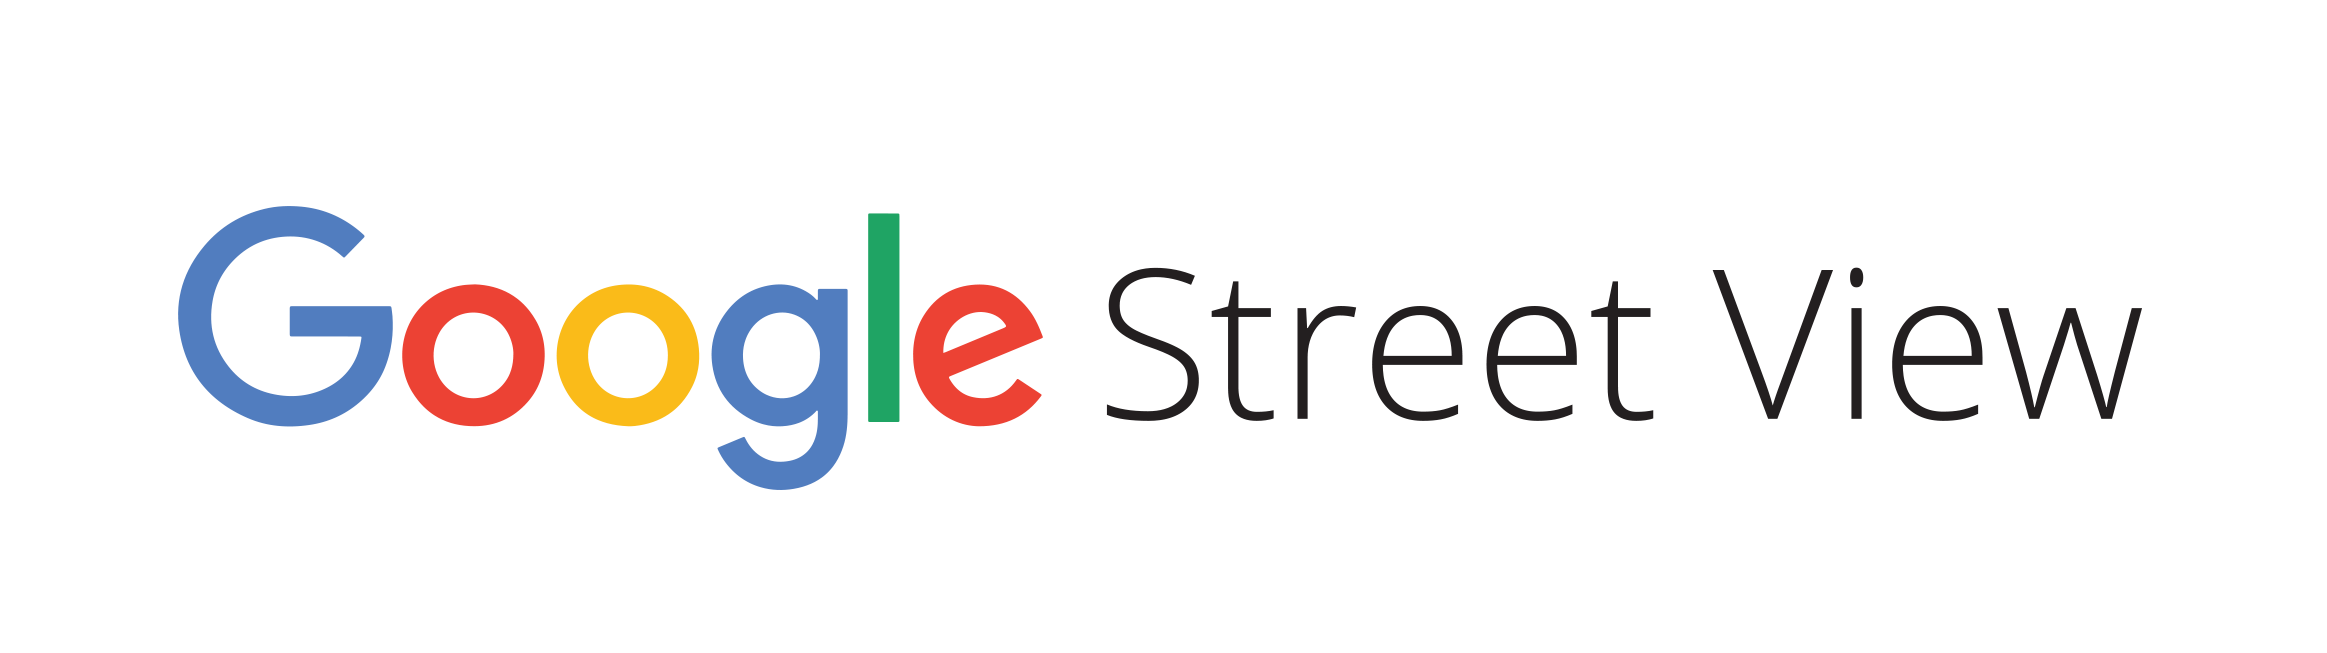 Google Street View Logo Chameleon Web Services